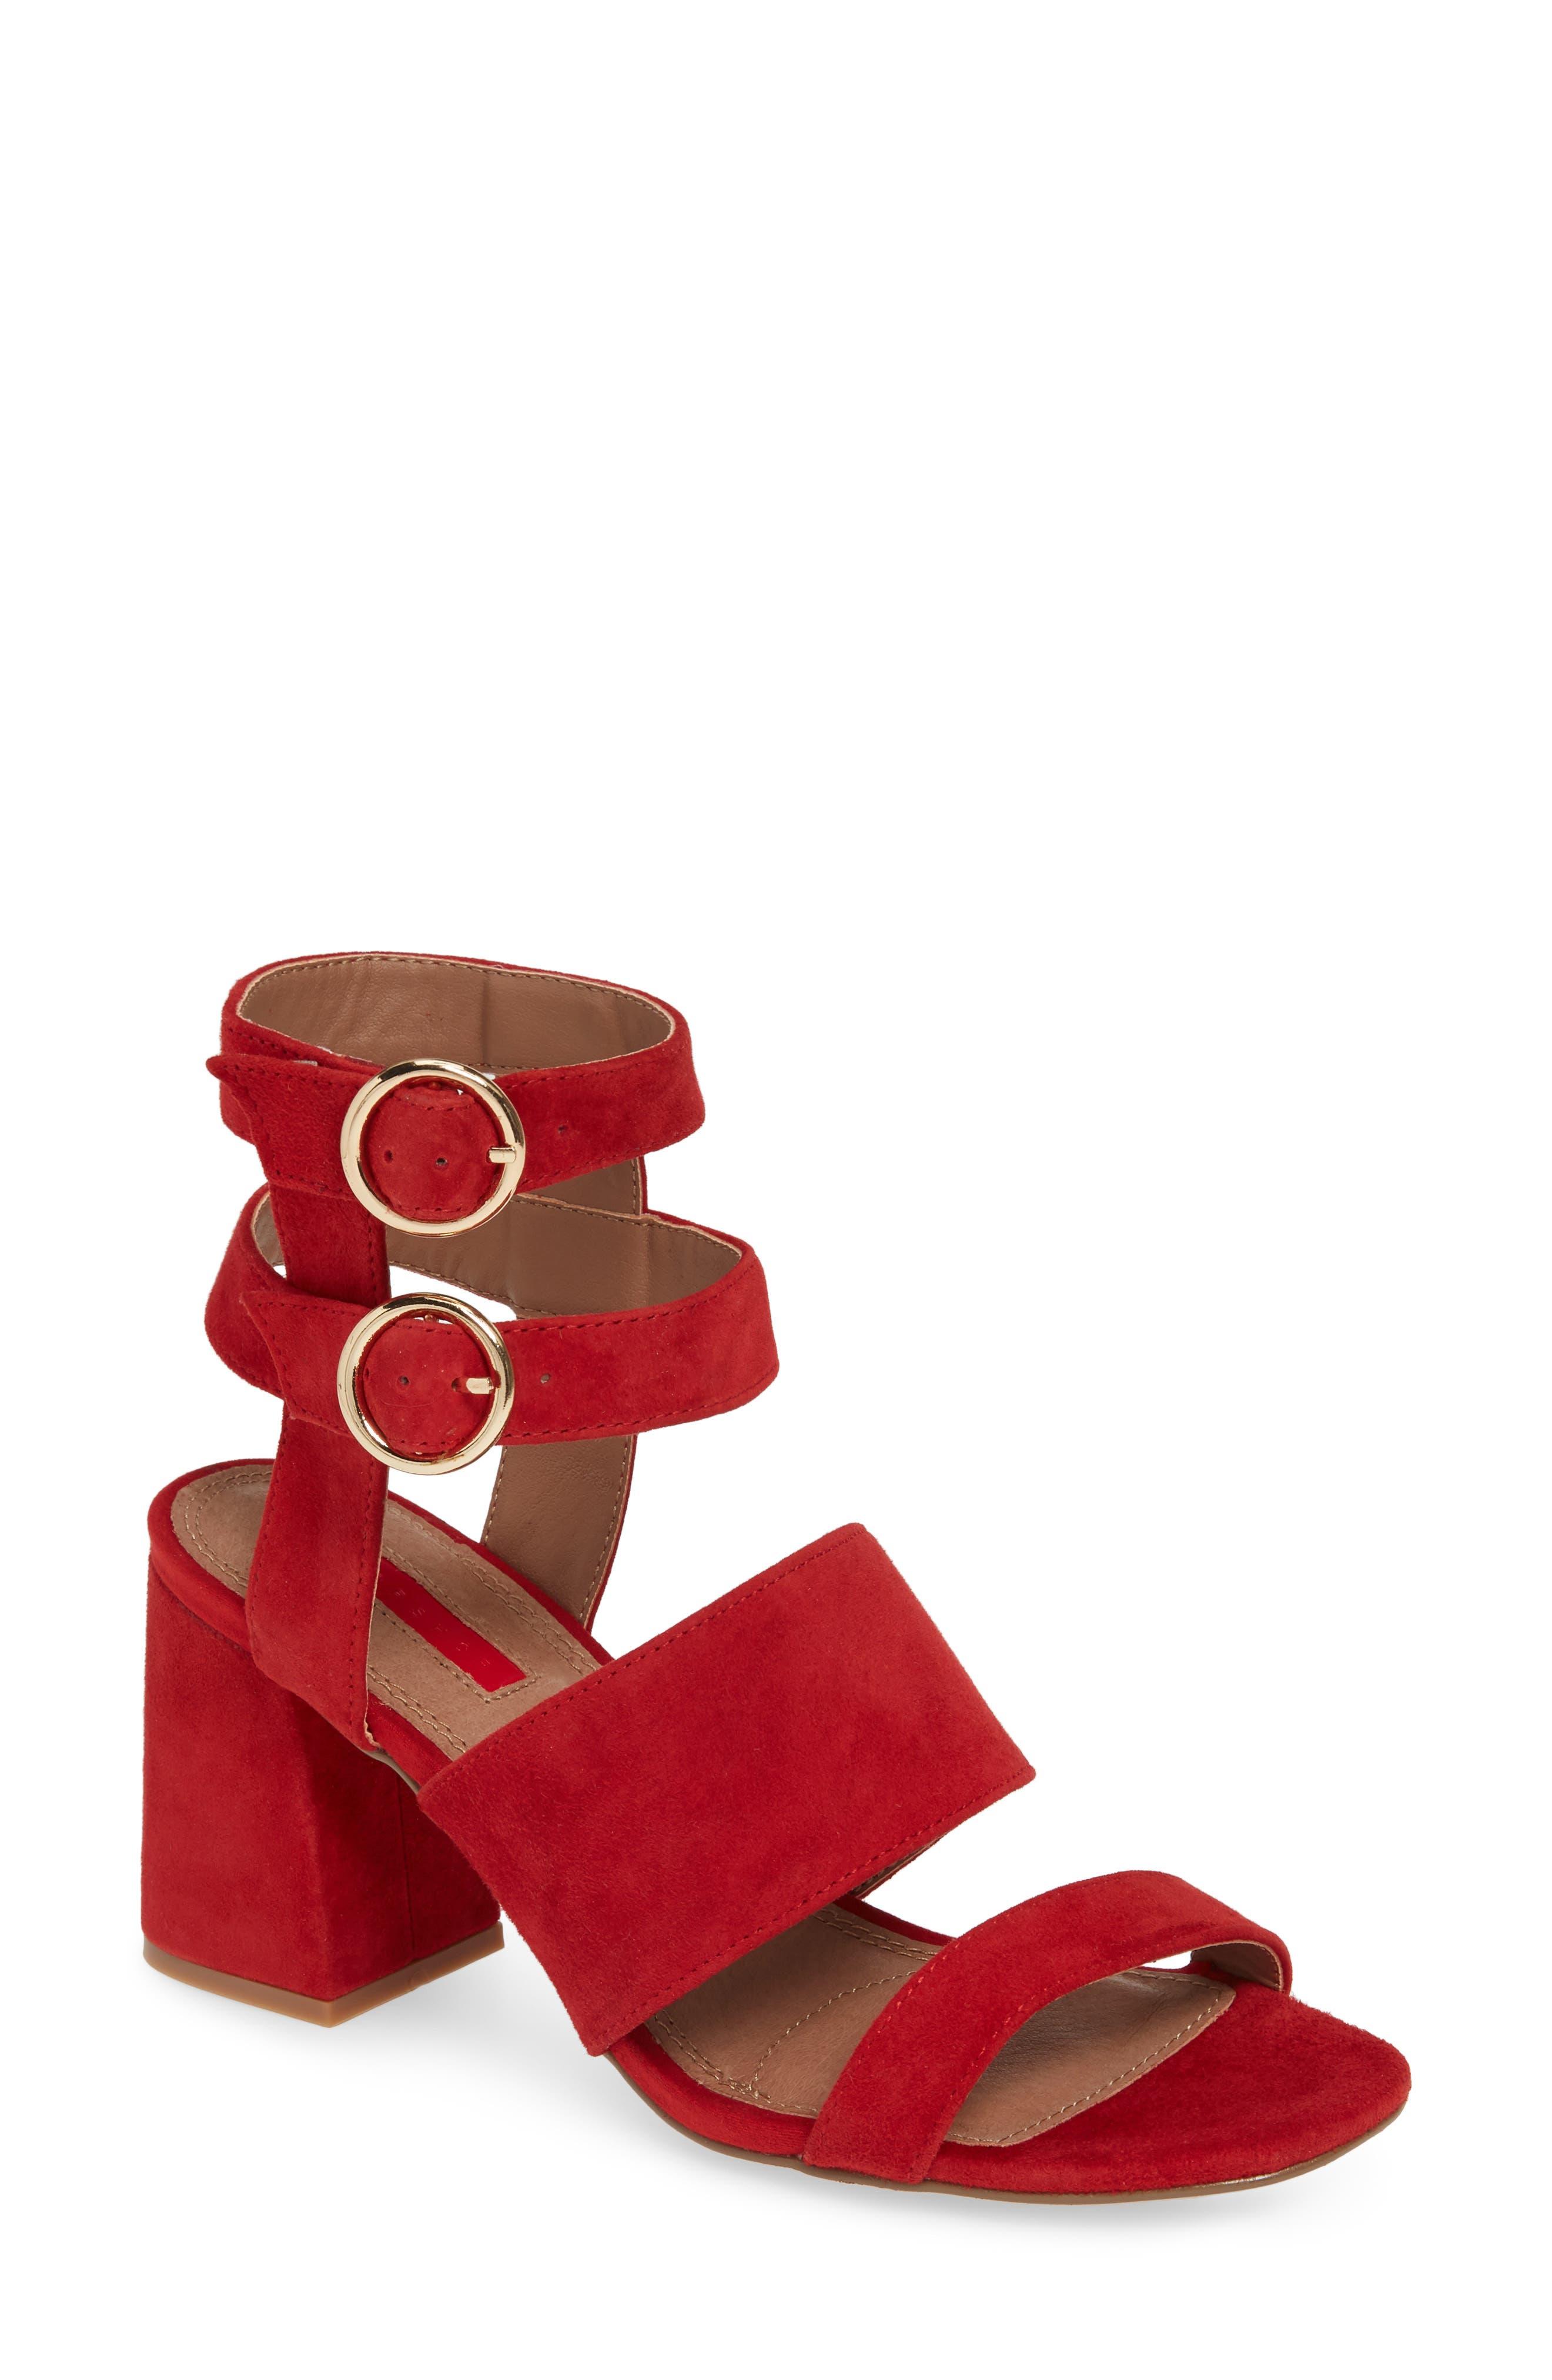 c075a83054f20 Women's Topshop Shoes | Nordstrom